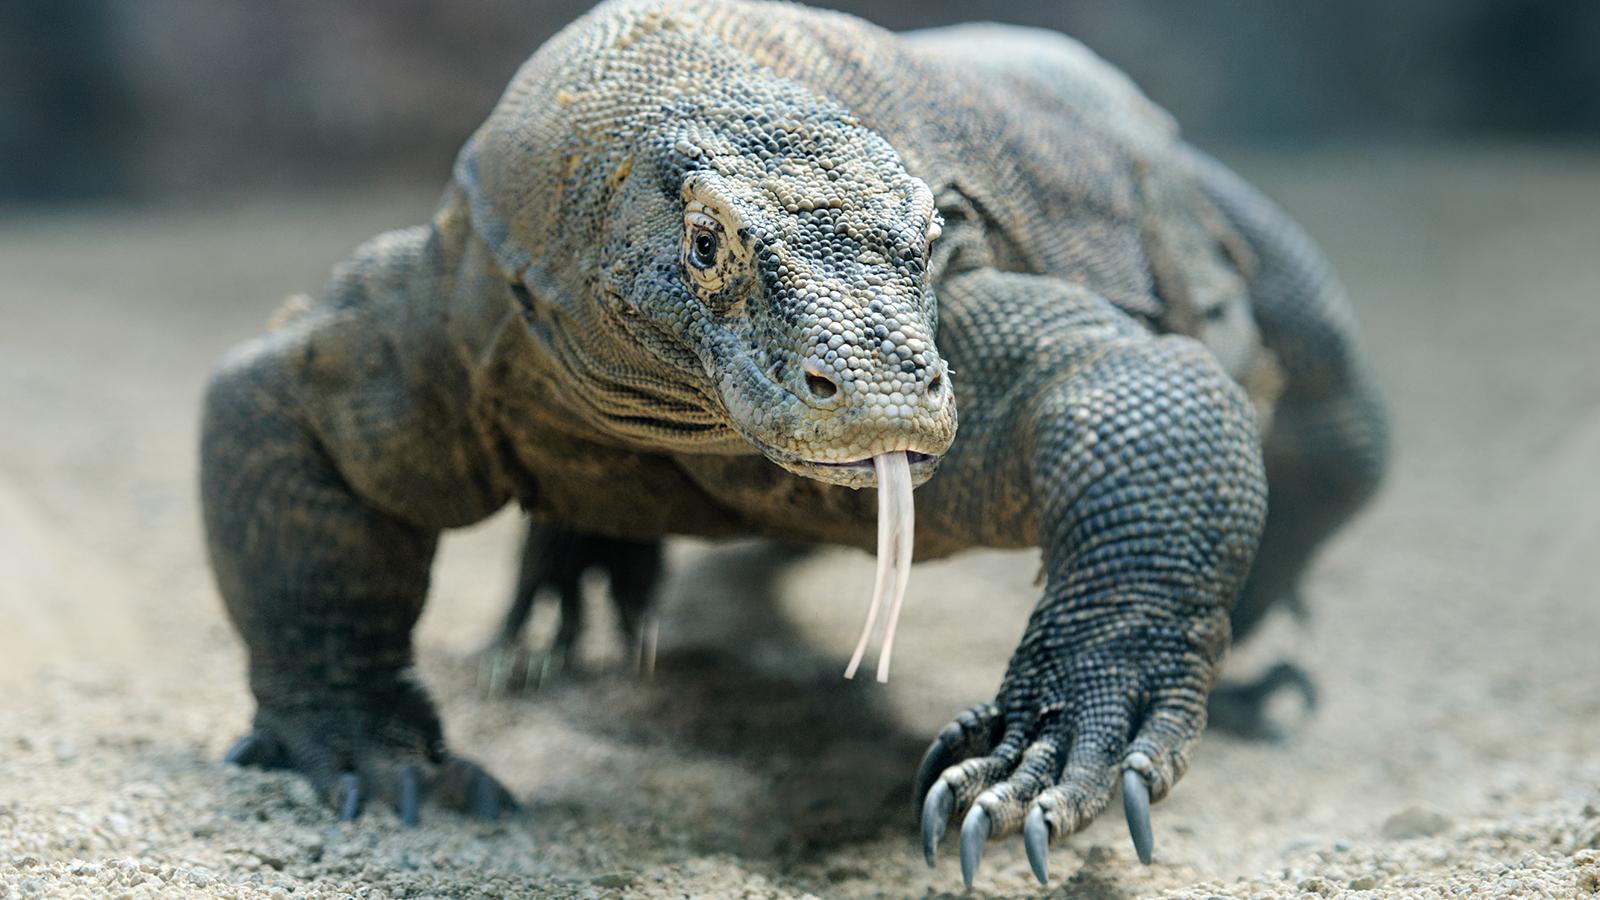 2. Komodo Dragons